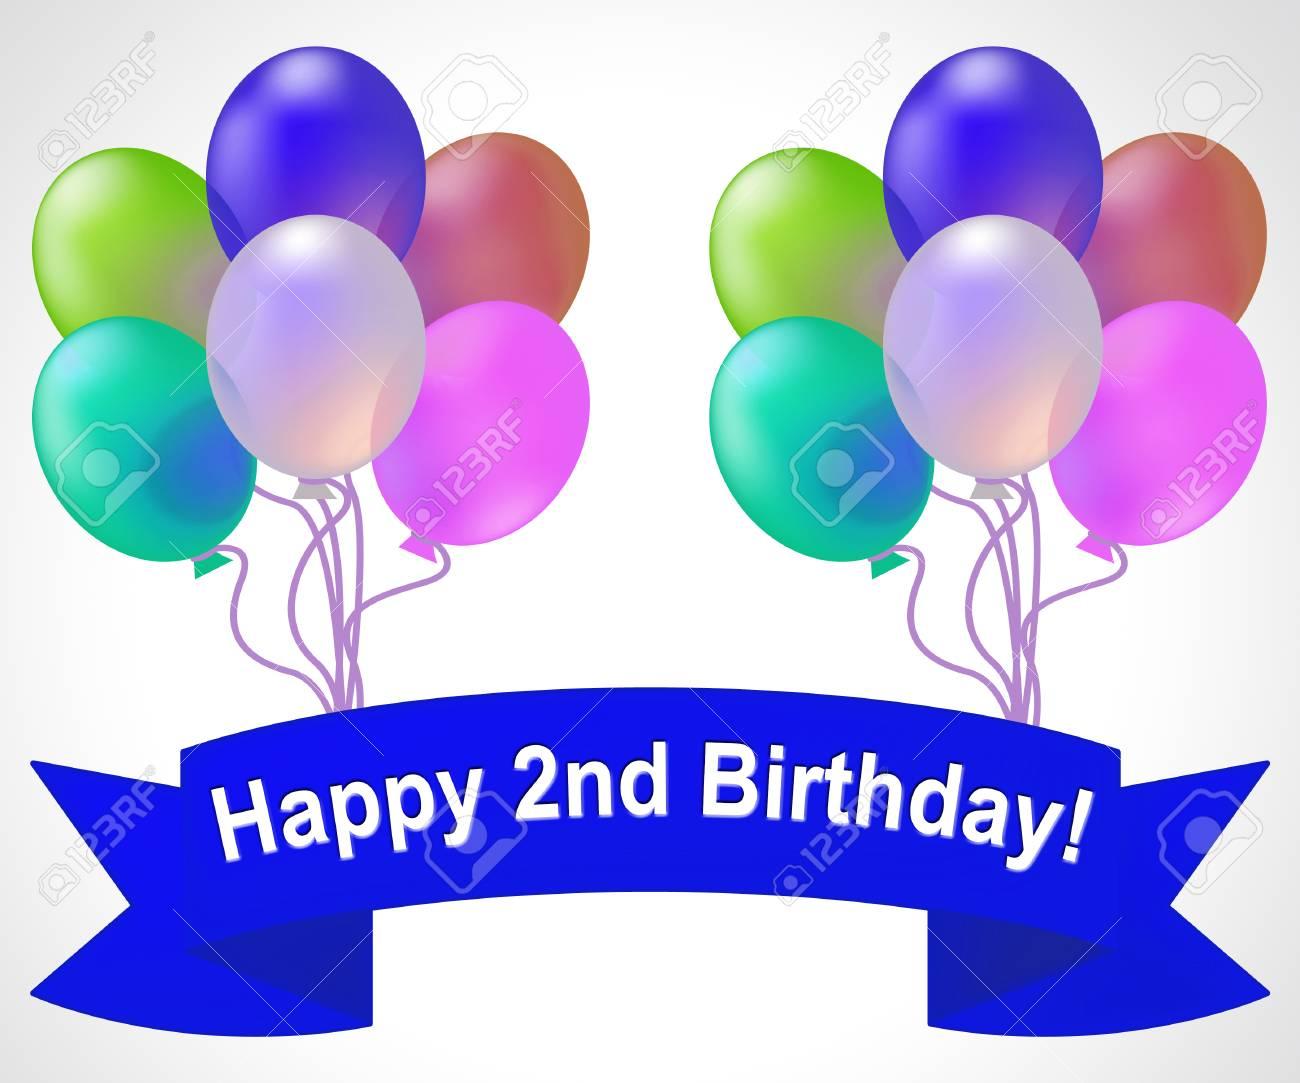 Happy Second Birthday Balloons Meaning Congratulation Celebration 3d Illustration Stock